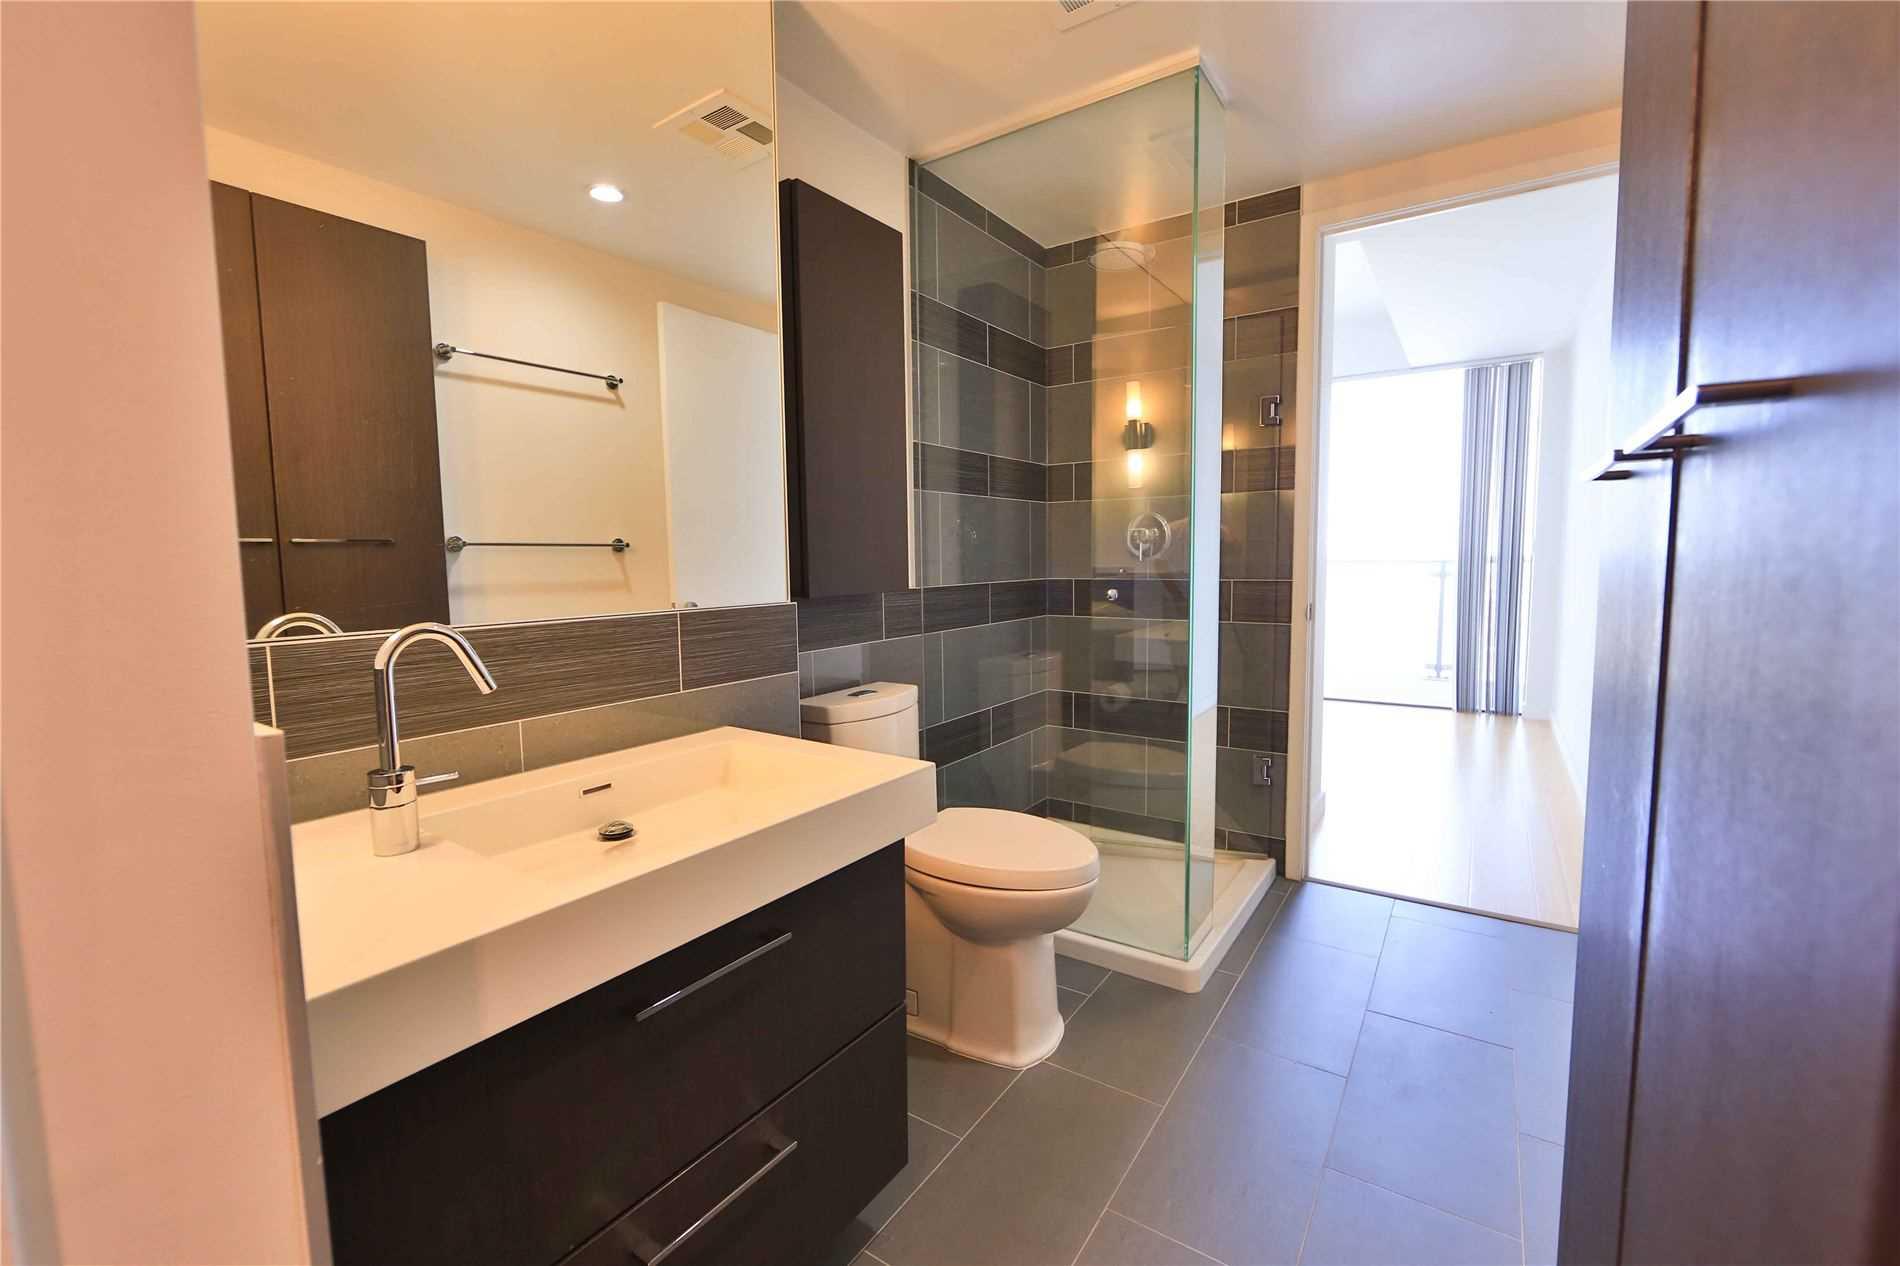 Condo Apt For Sale In Toronto , 2 Bedrooms Bedrooms, ,2 BathroomsBathrooms,Condo Apt,For Sale,3003,Distillery